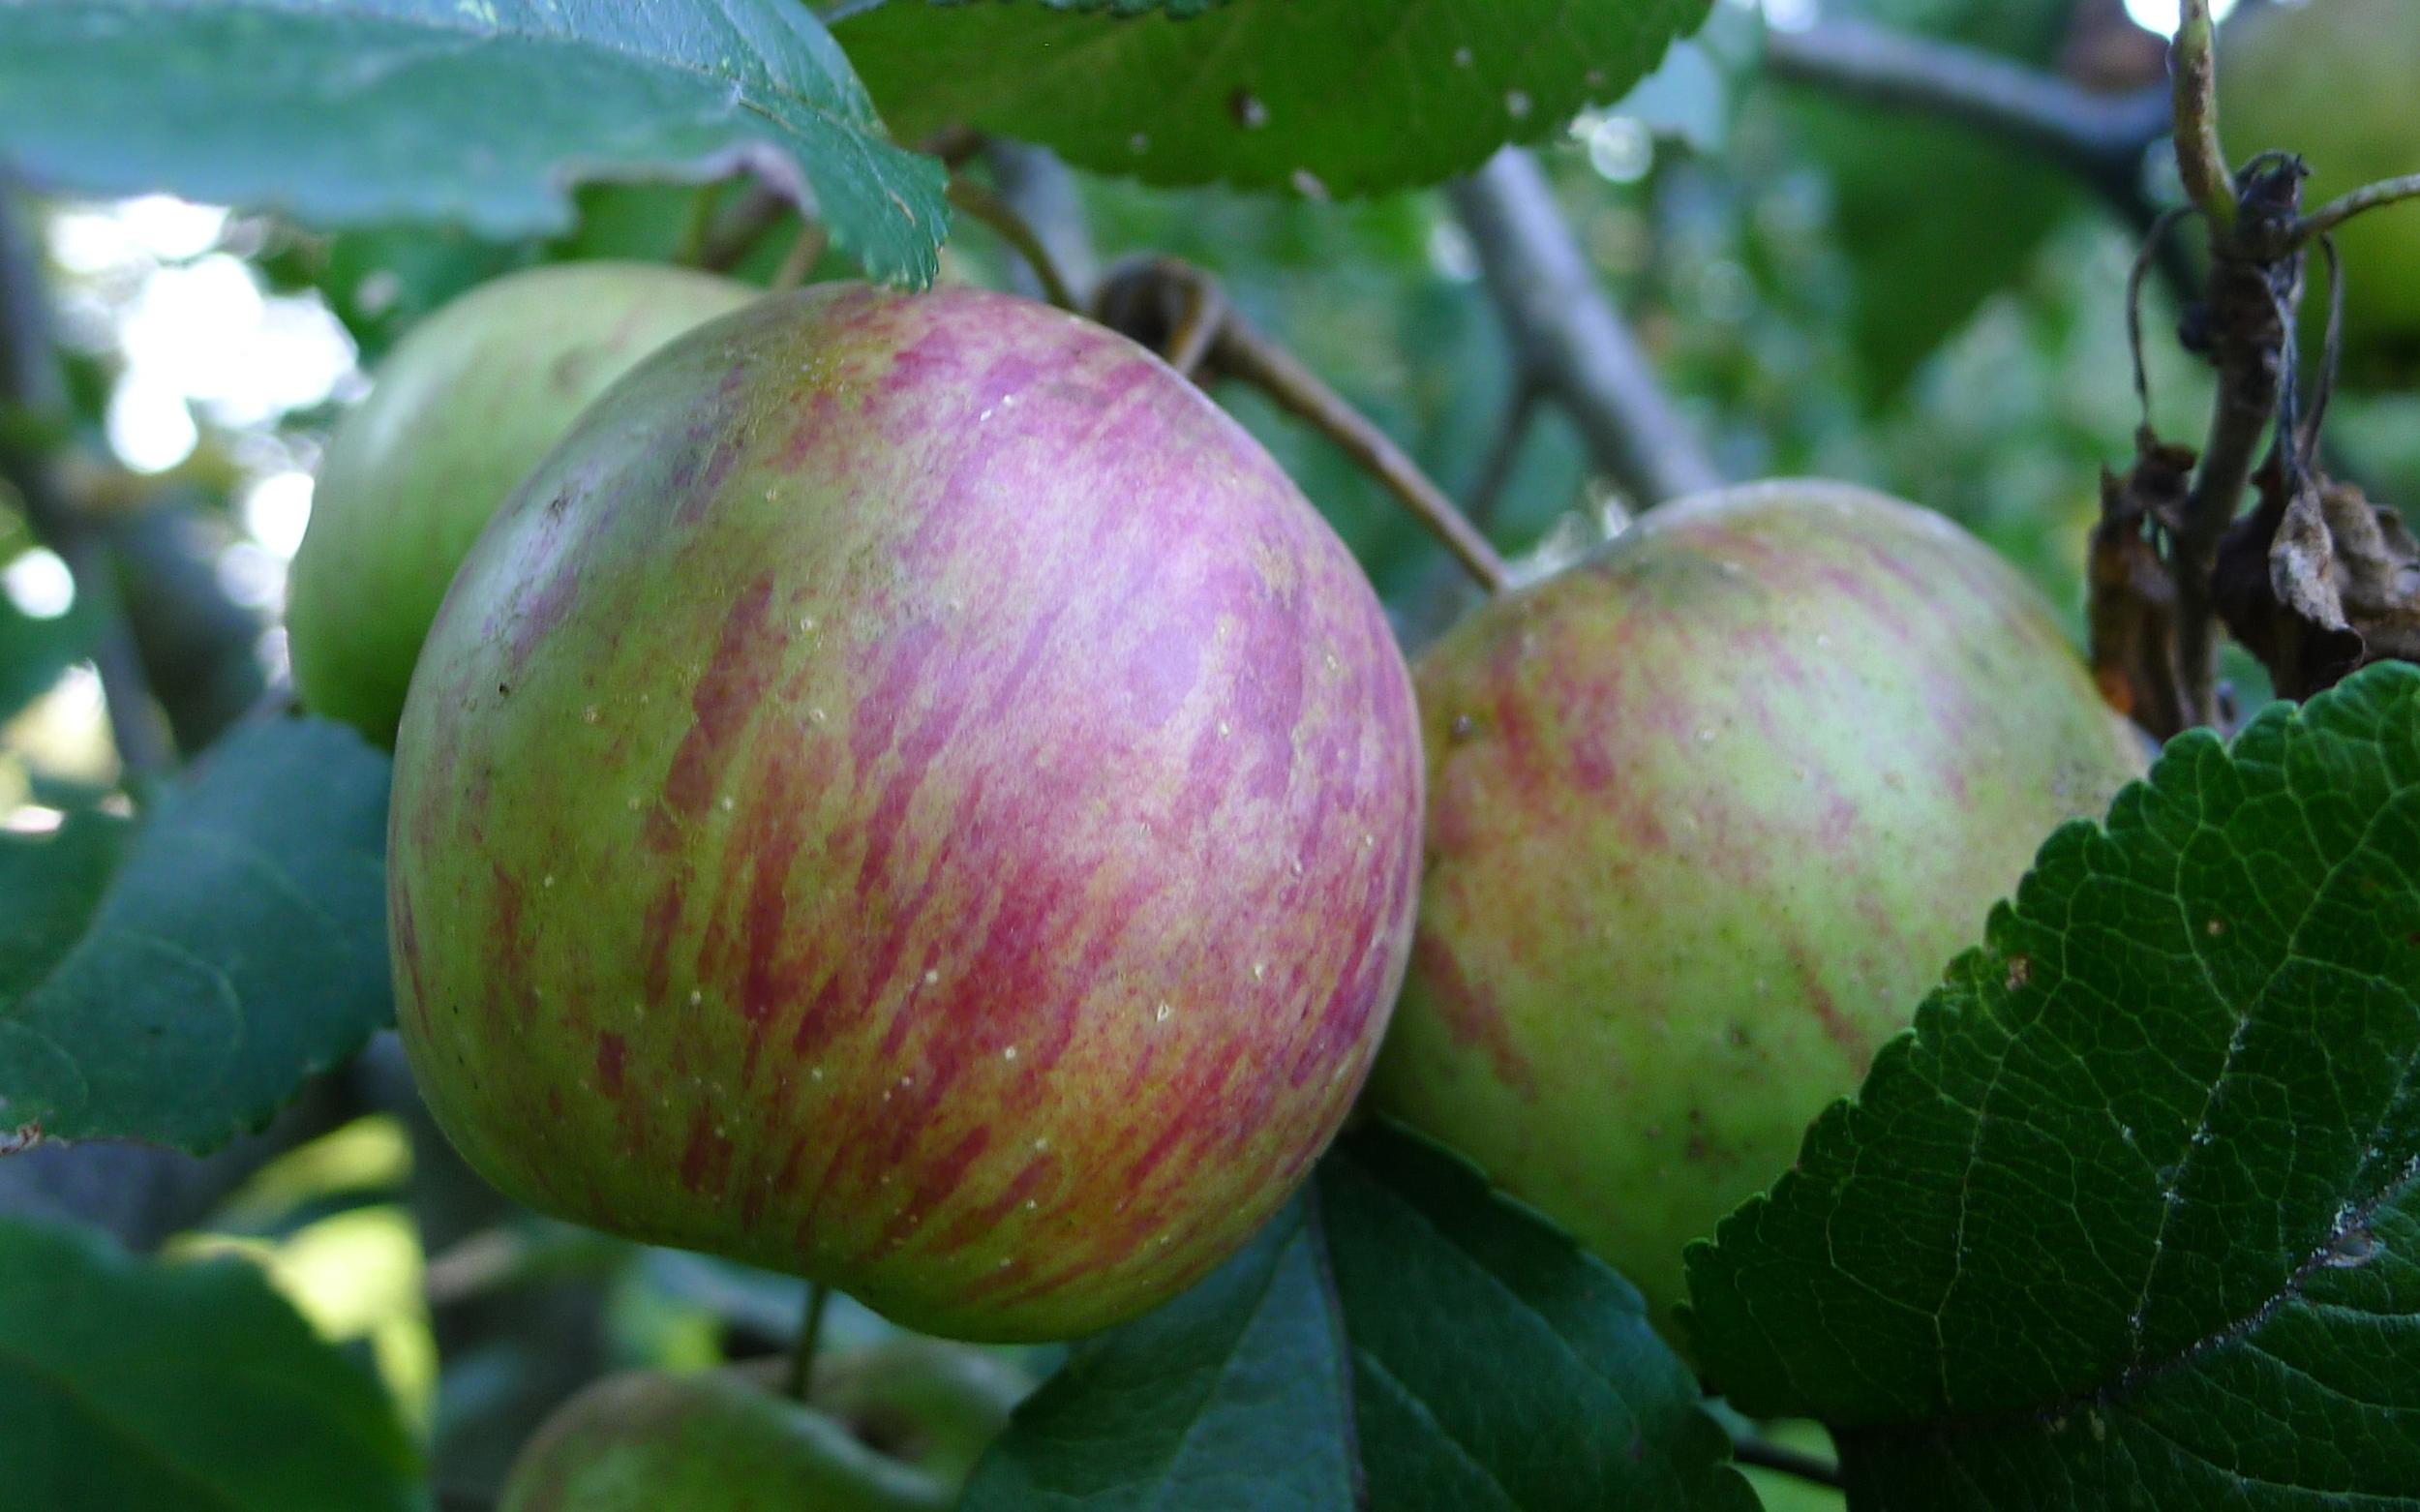 chesnut apples, ripening